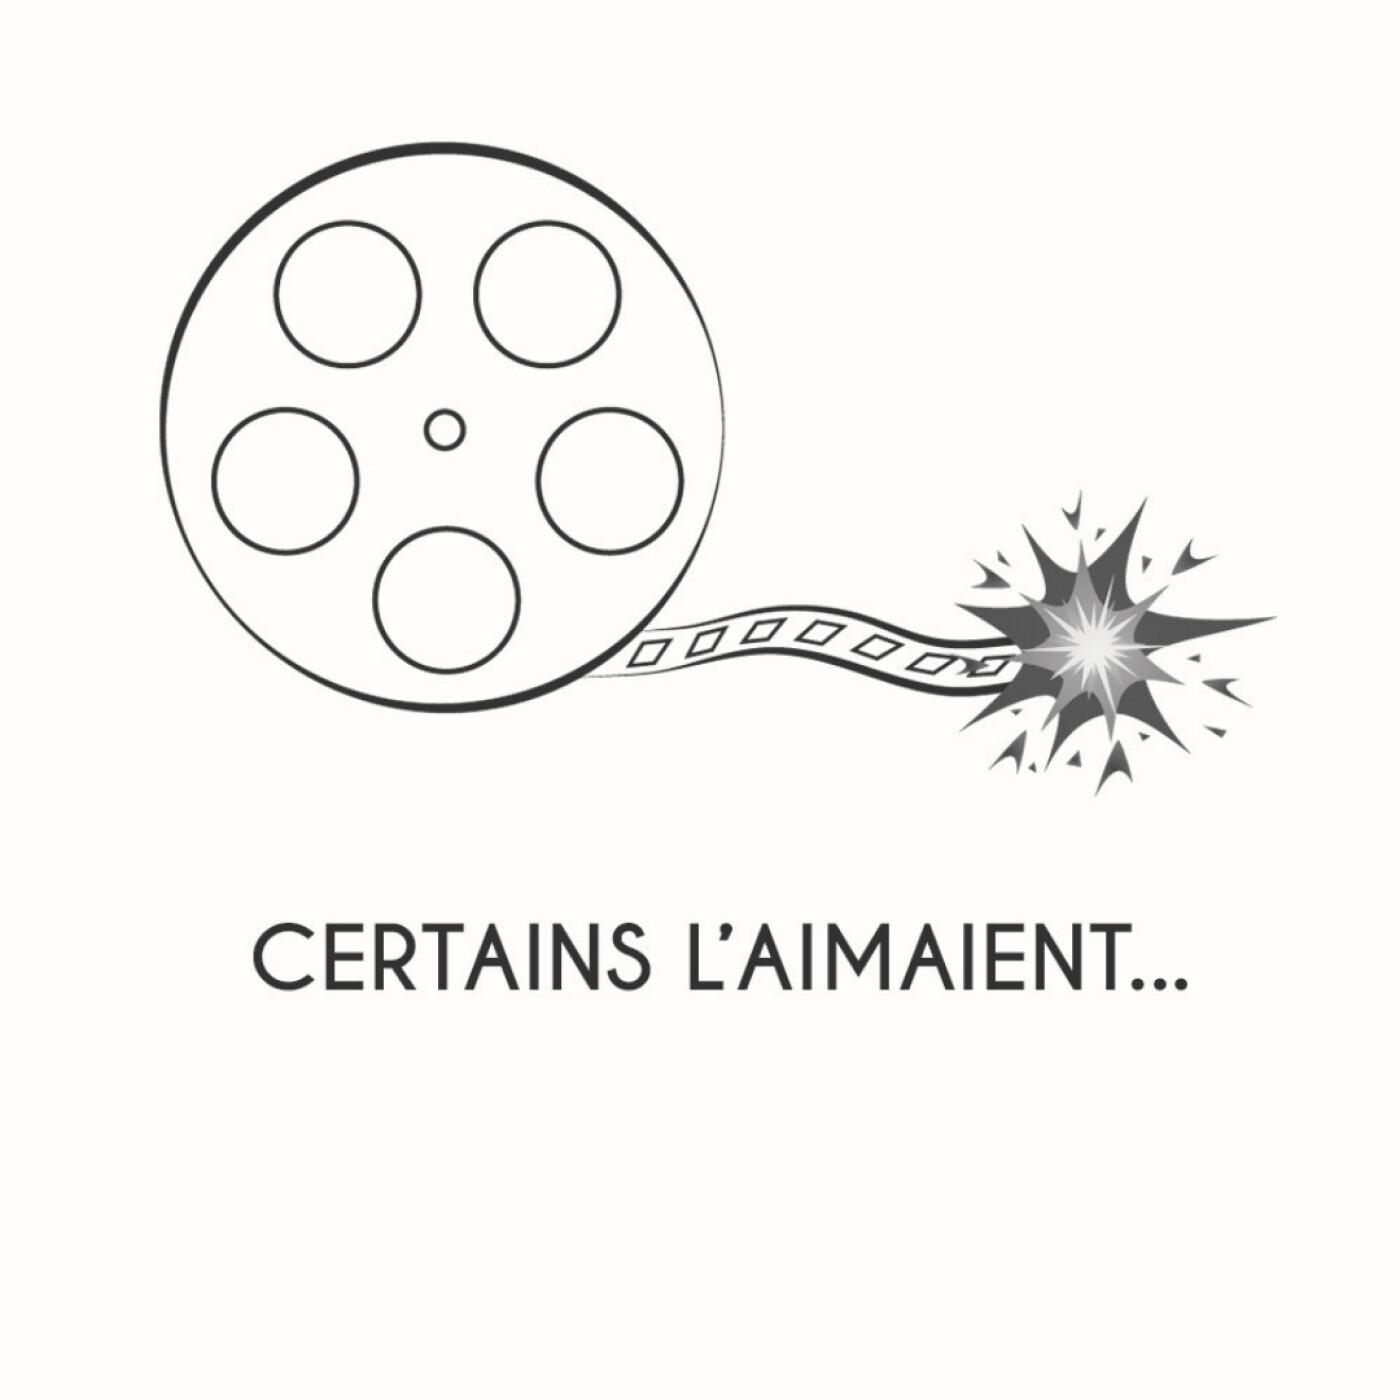 La Nuée – Falling – Détective Conan – Garçon Chiffon – The Craft Legacy